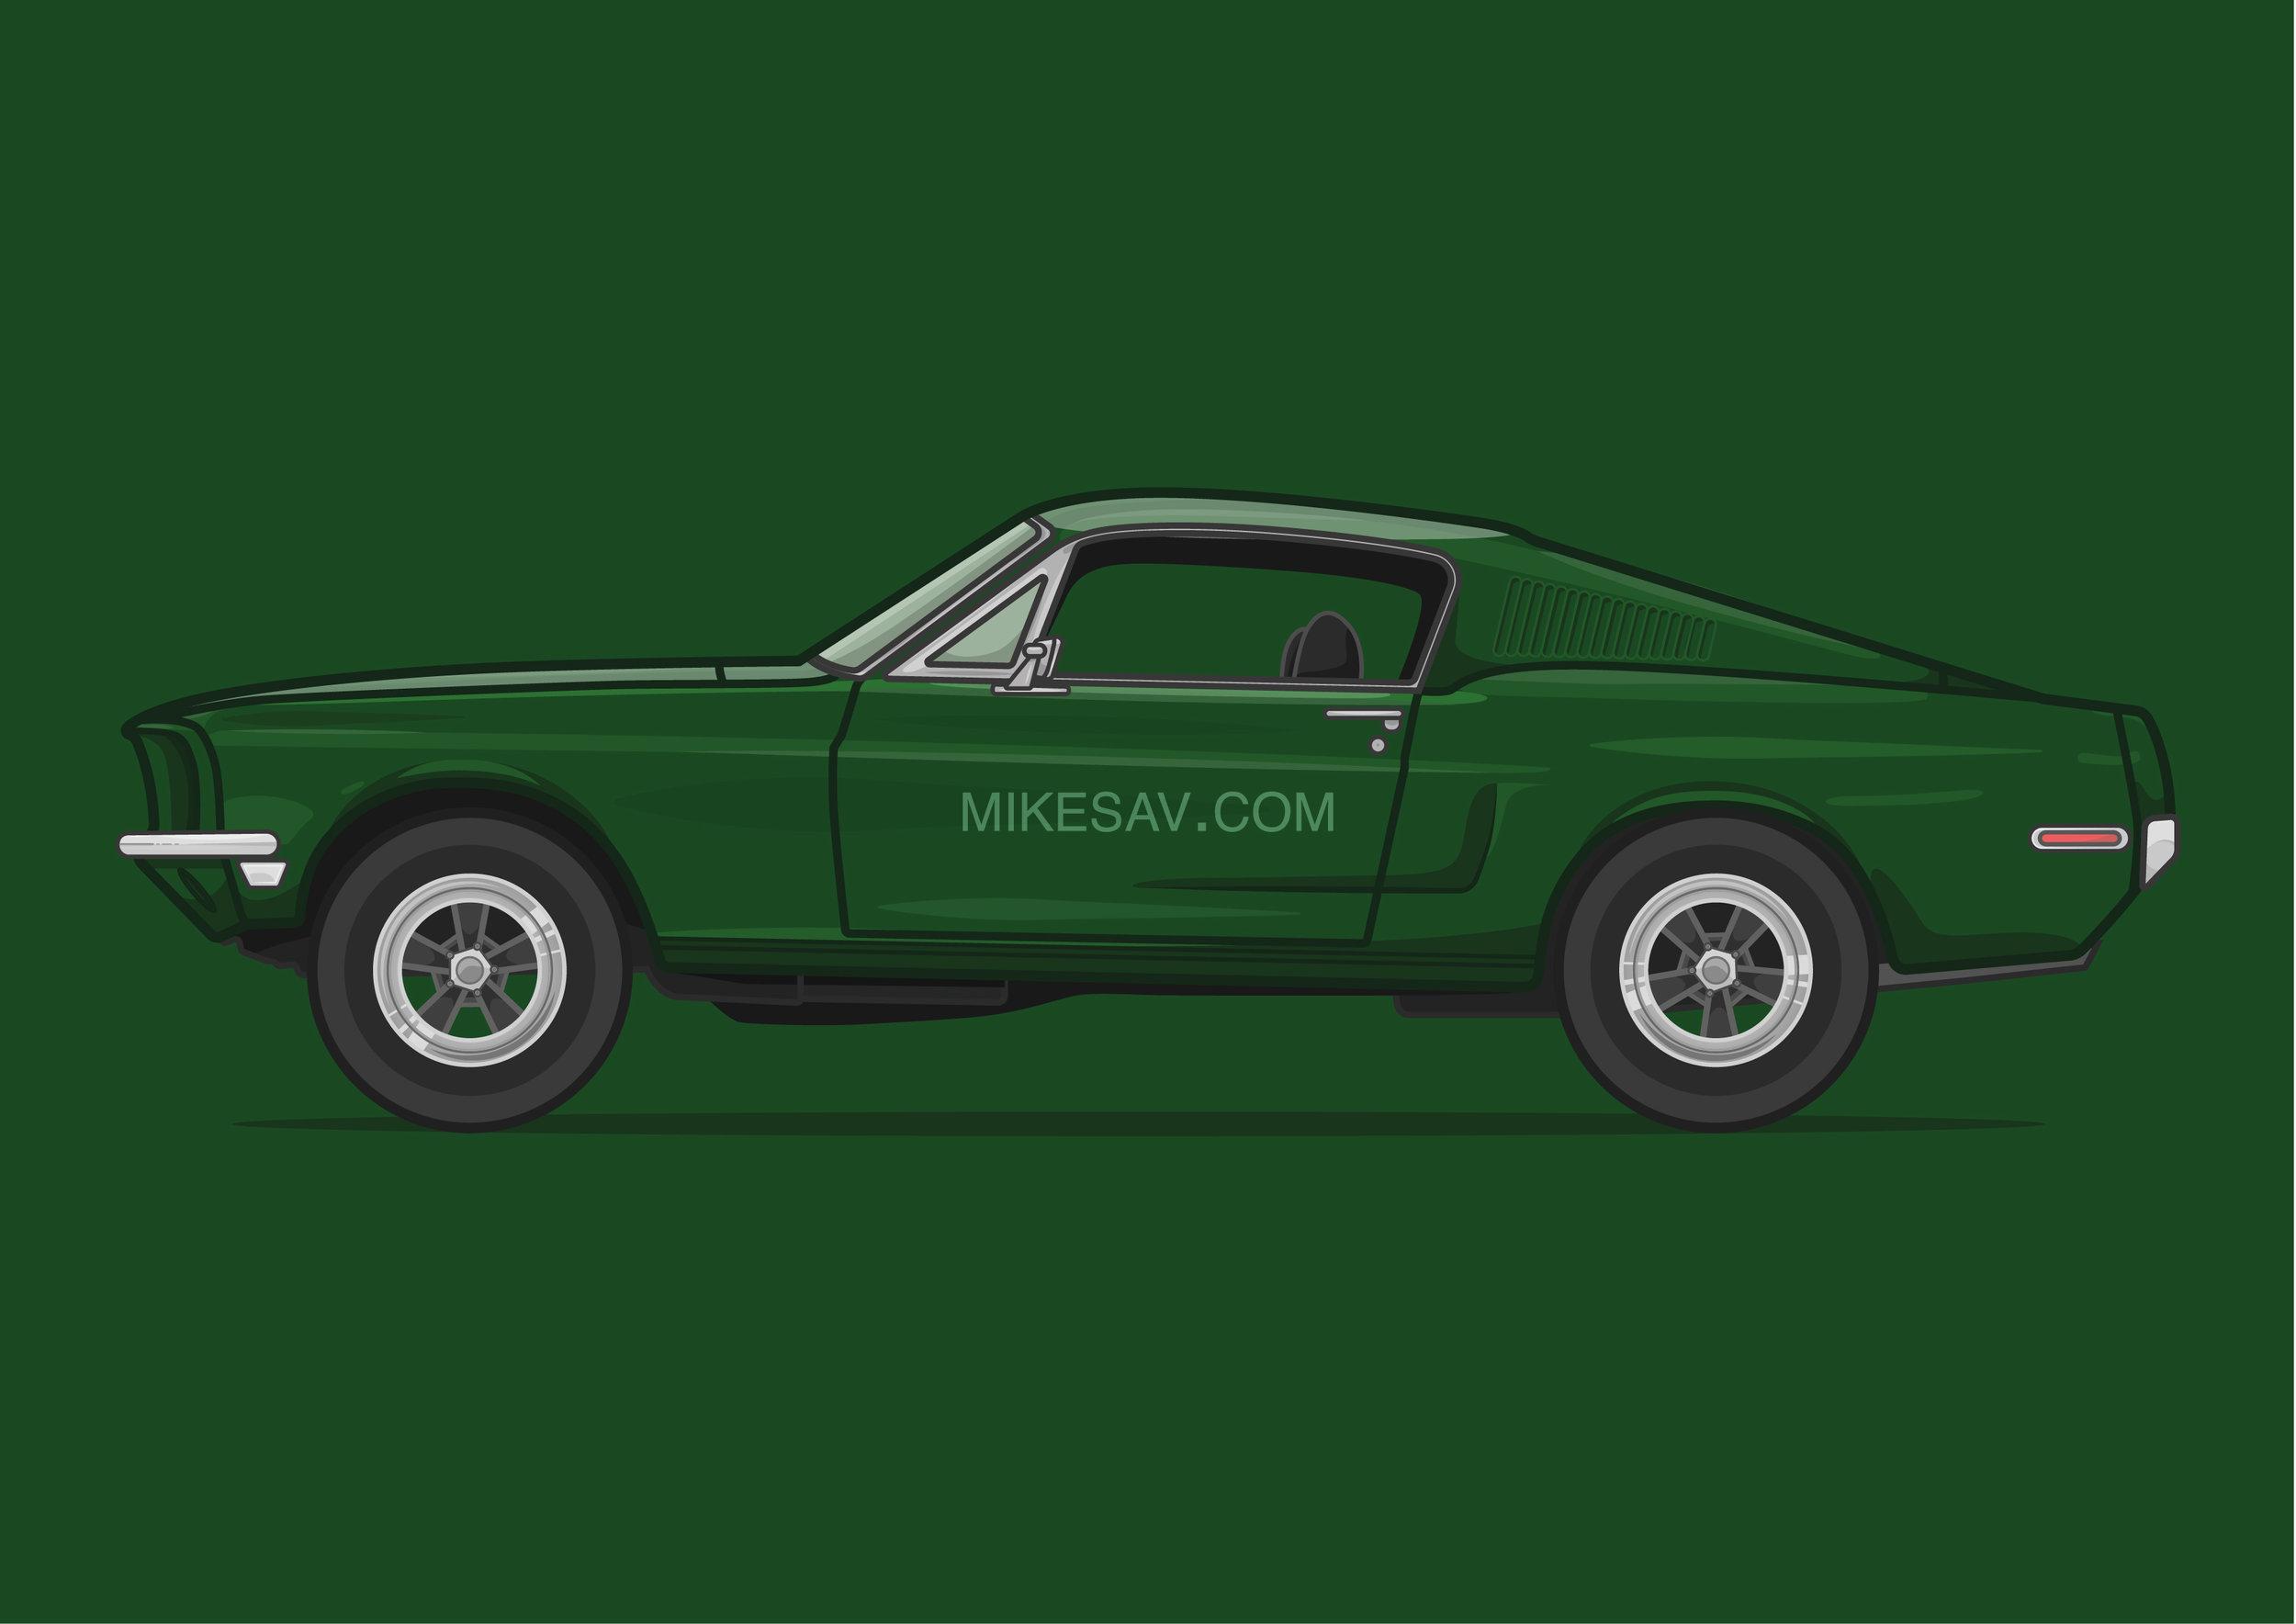 Ford Mustang Fastback / Bullitt (1968) / Director: Peter Yates